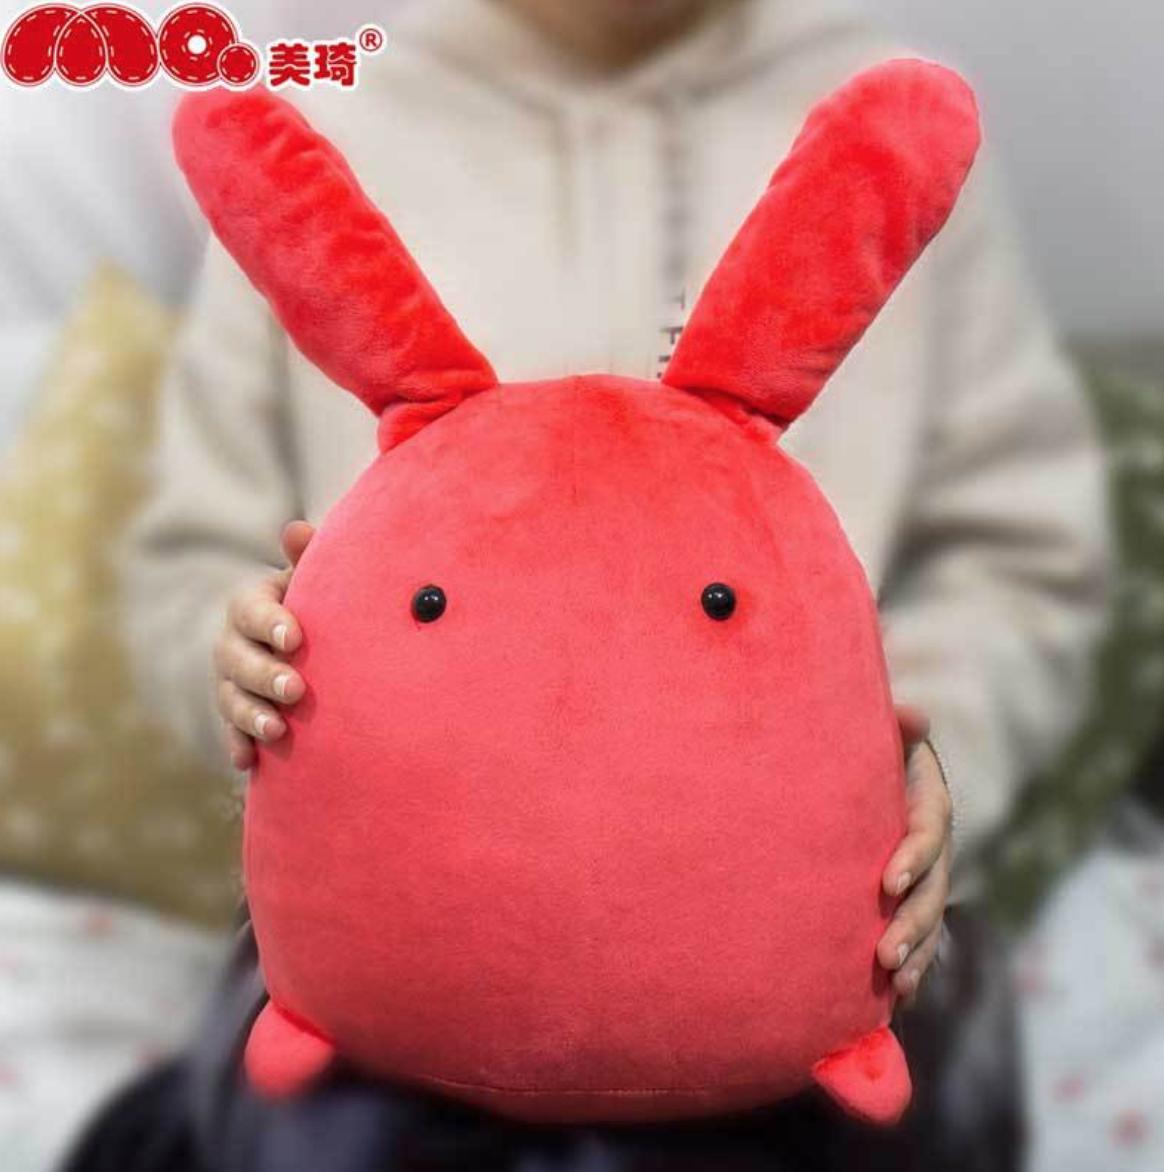 Red Rabbit Plush Toy